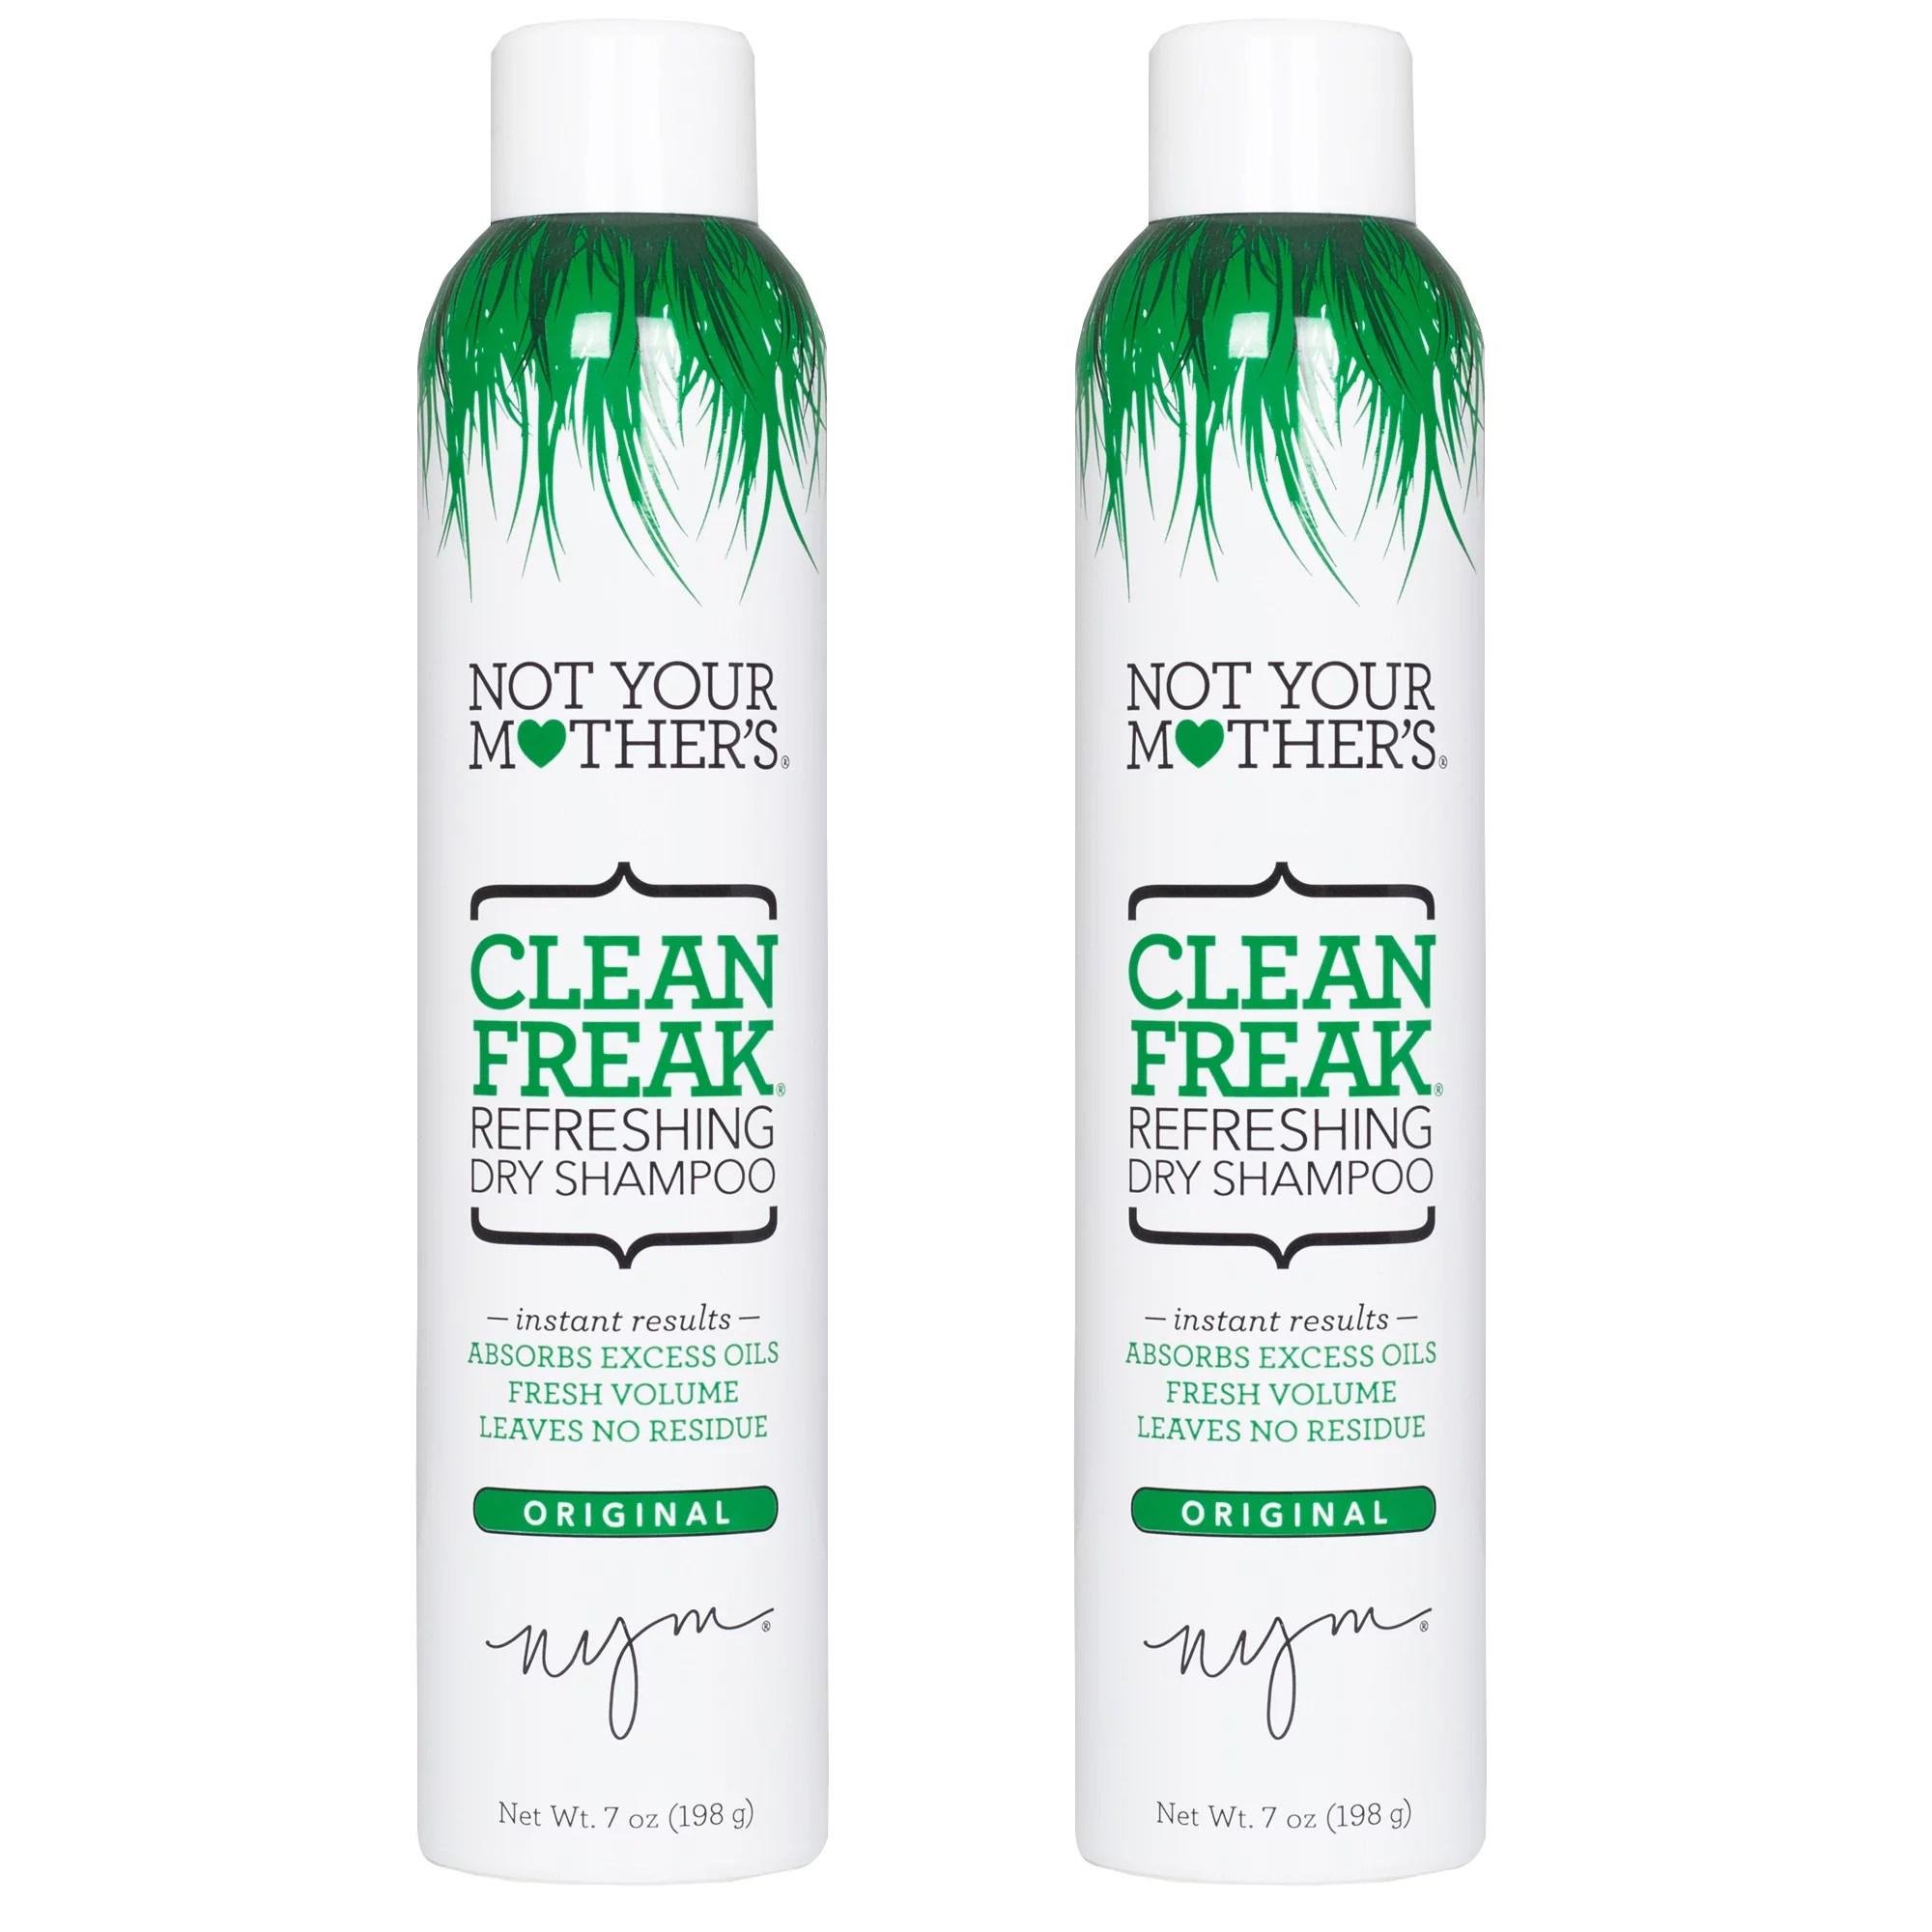 Not Your Mother's Clean Freak Original Dry Shampoo 7 oz ...